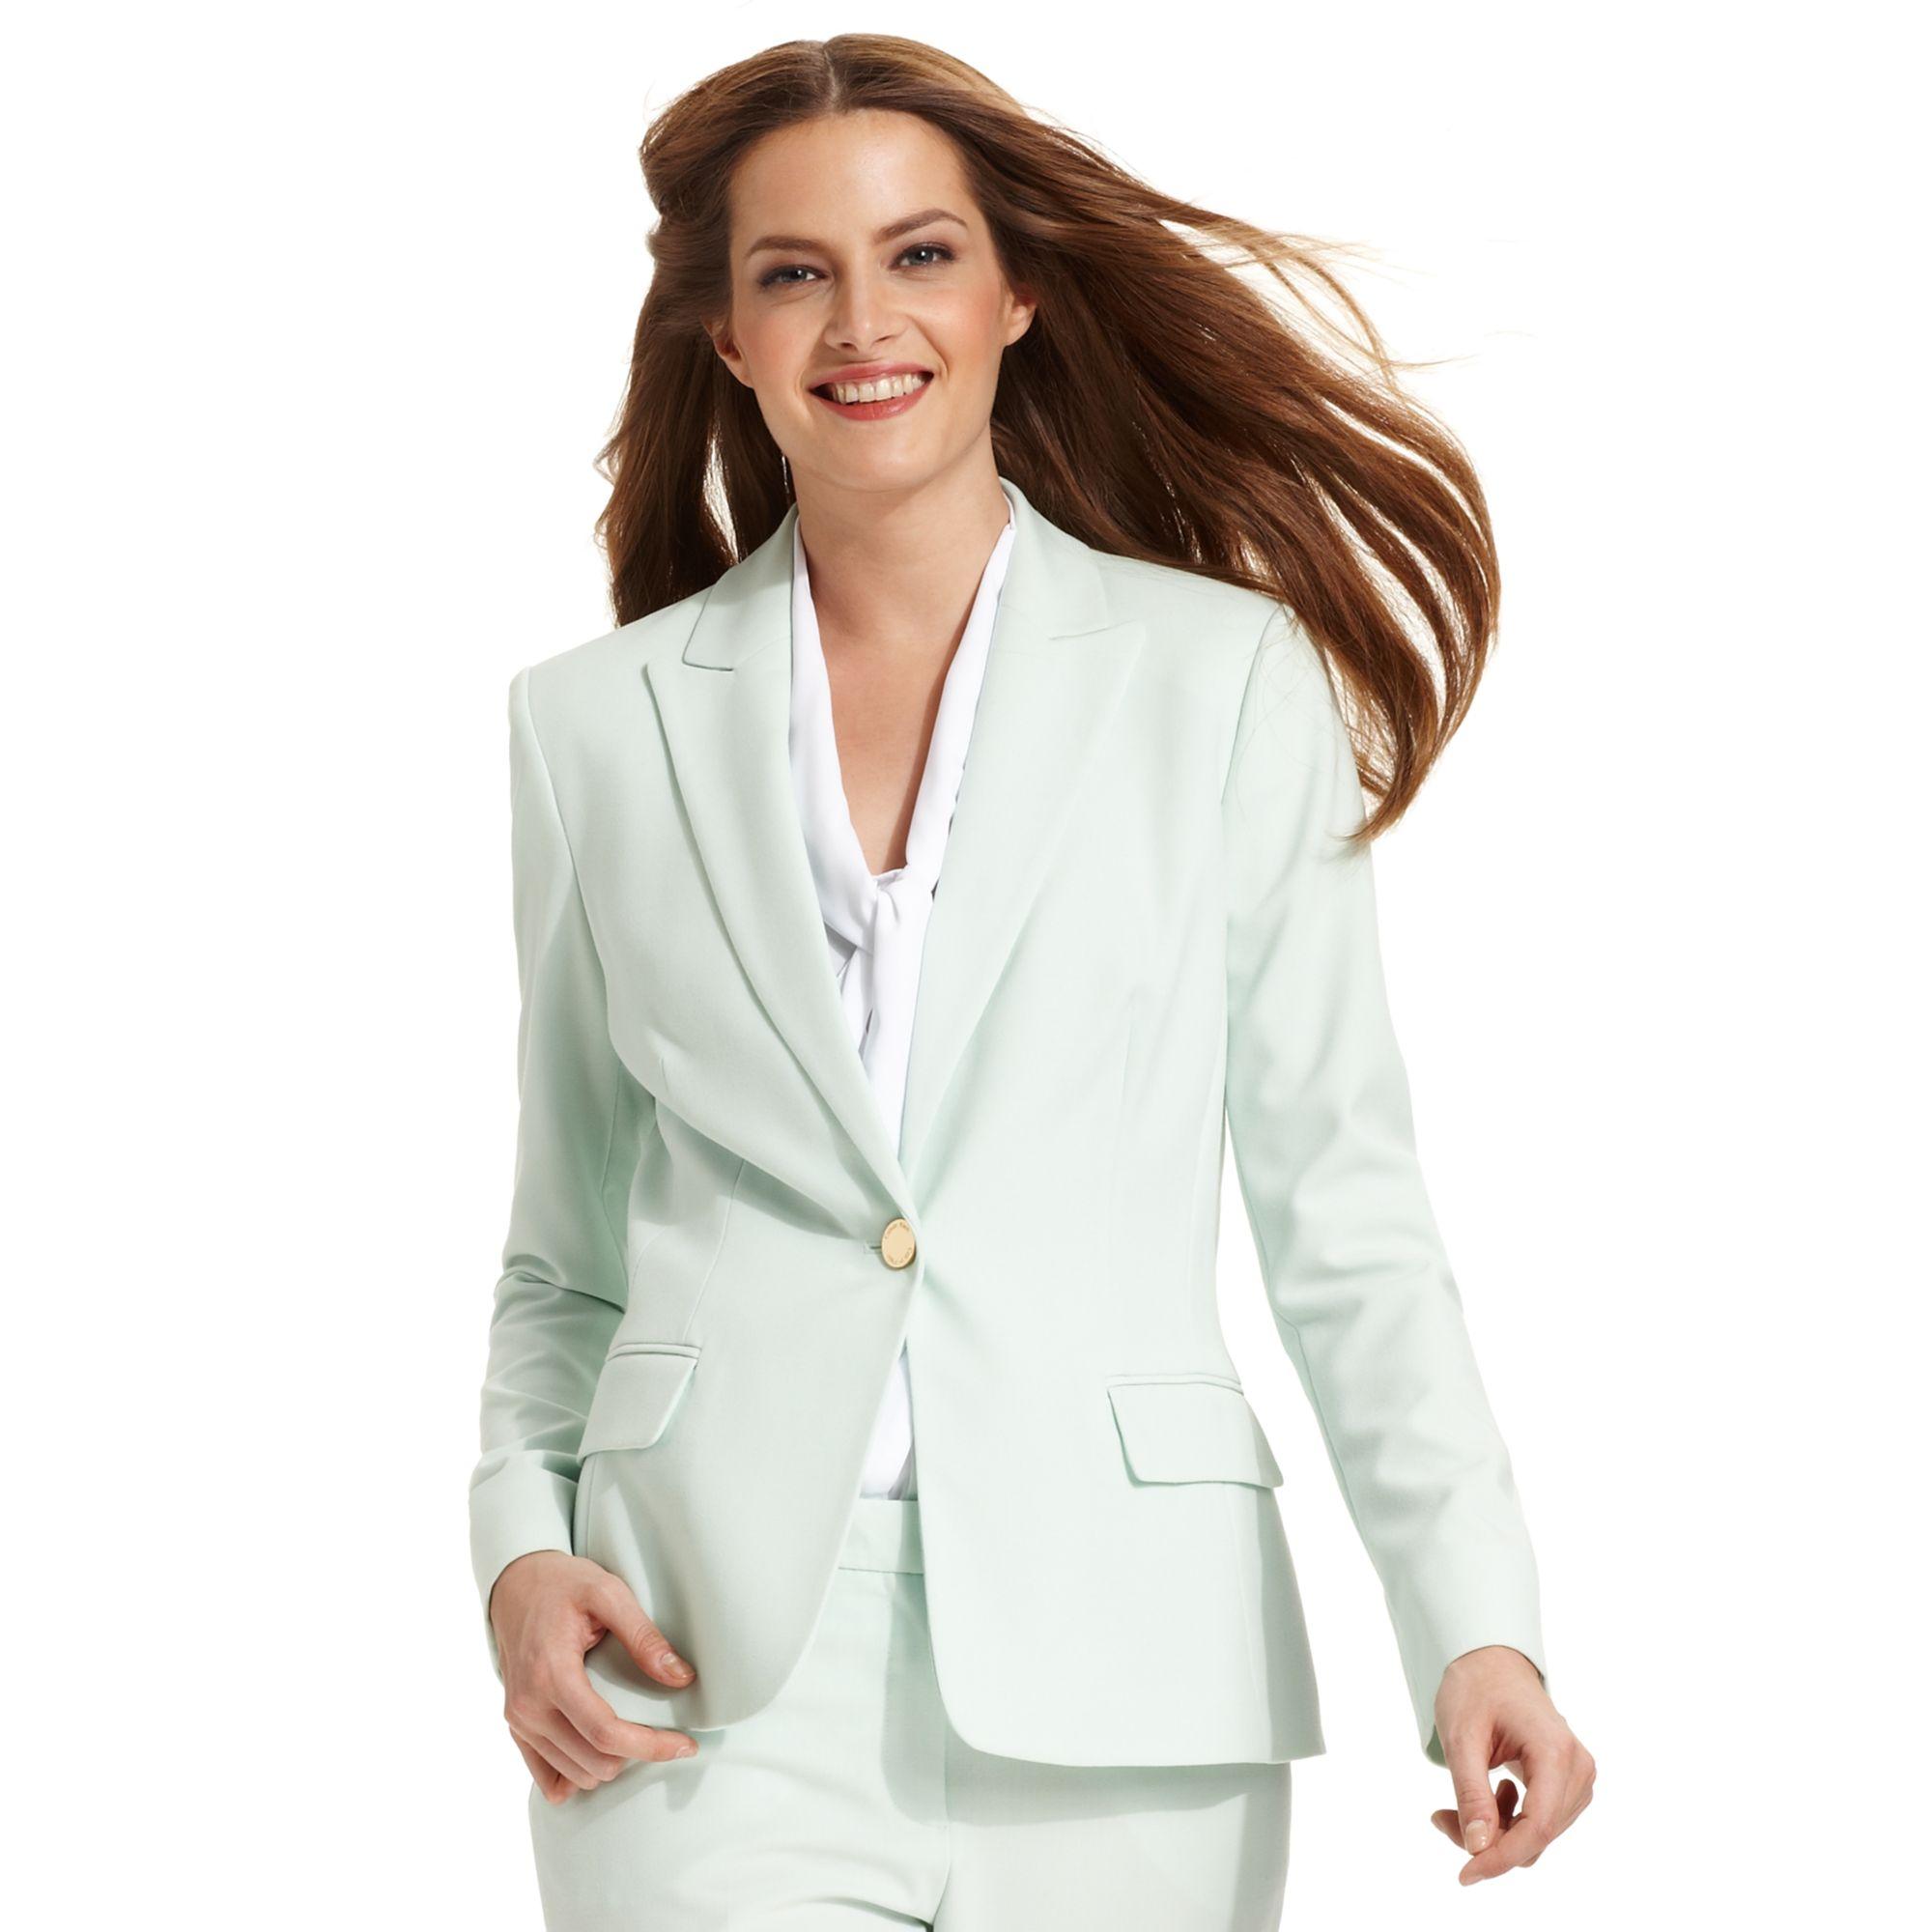 ab4e0c11fbd Lyst - Calvin Klein Singlebutton Mint Blazer in Green